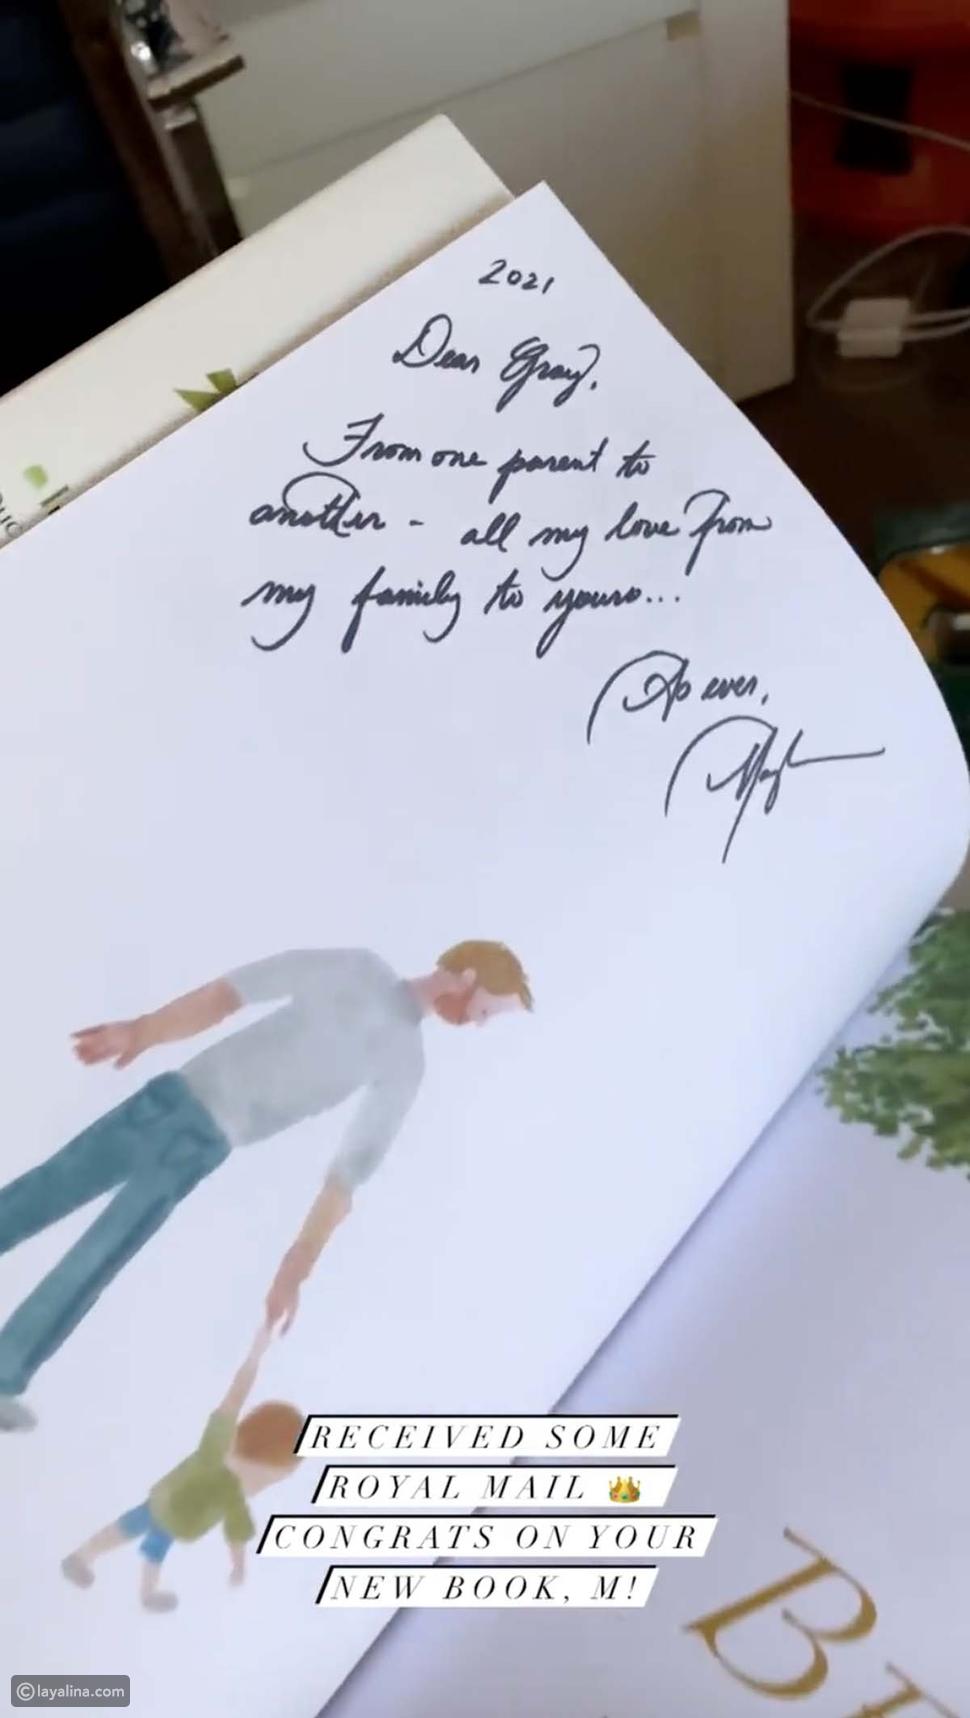 الأمير هاري يعلن موعد نشر مذكراته: ستحقق 20 مليون دولار